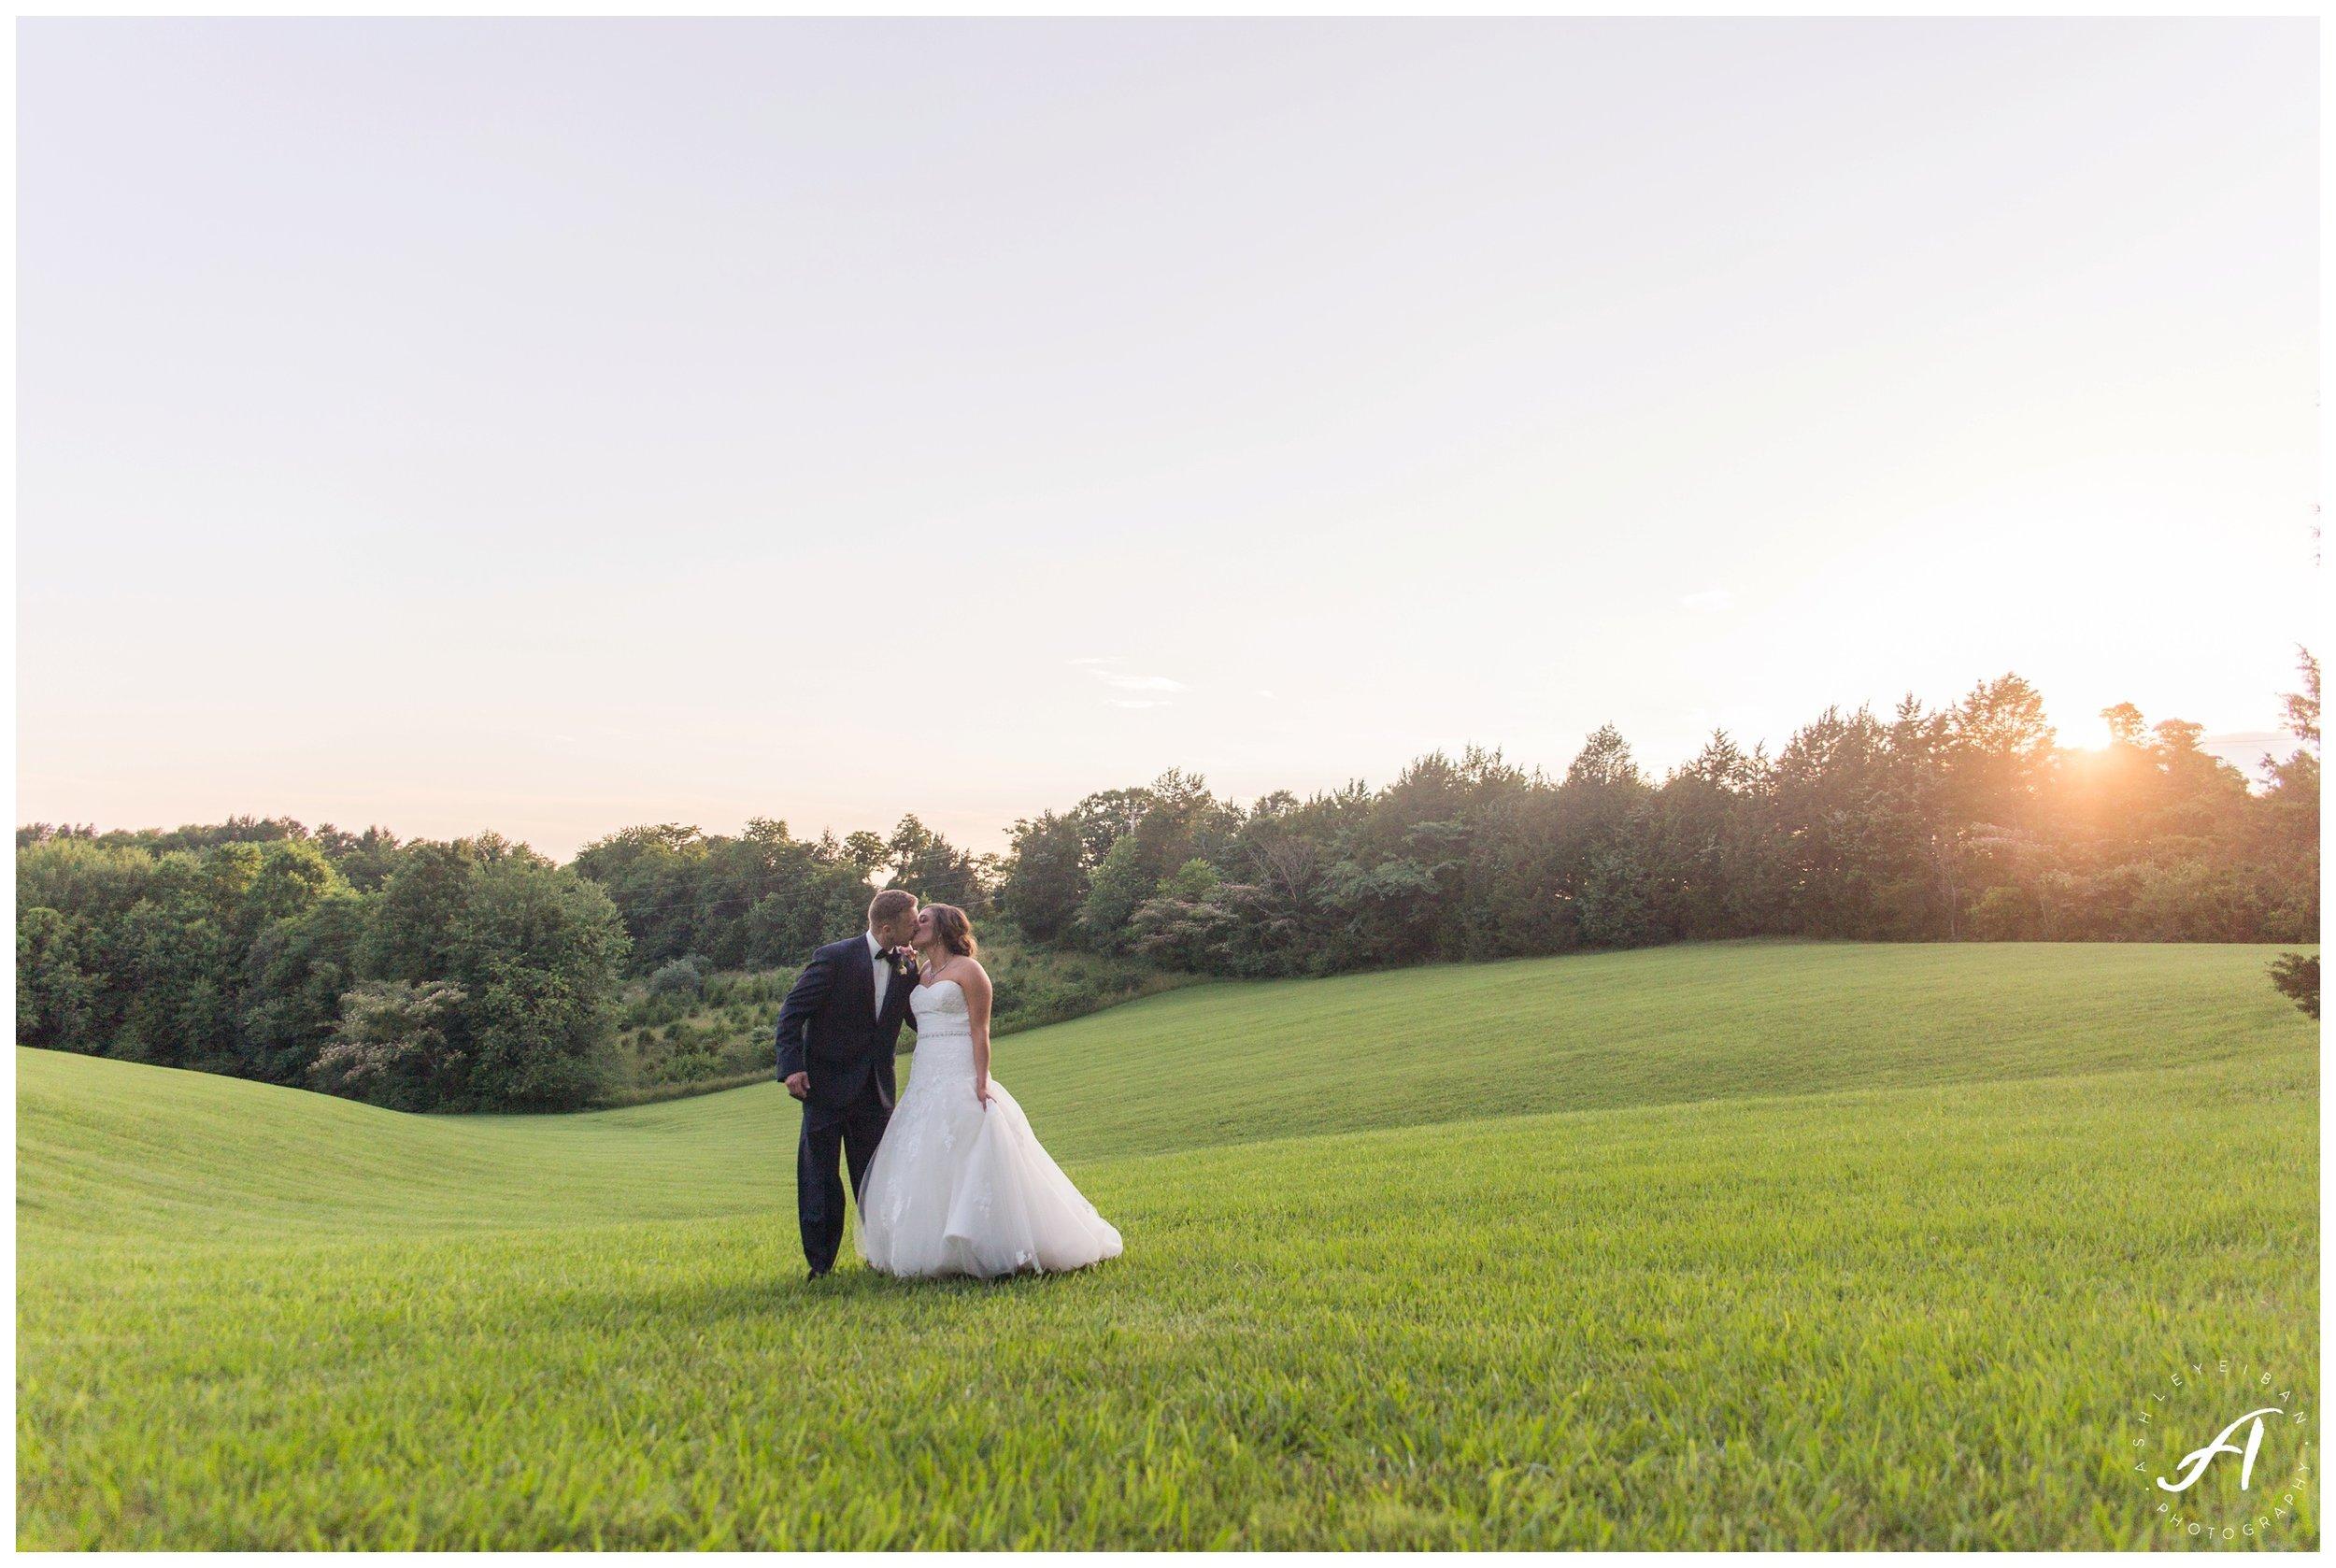 Charlottesville and Lynchburg Wedding Photography at The Trivium Estate || www.ashleyeiban.com